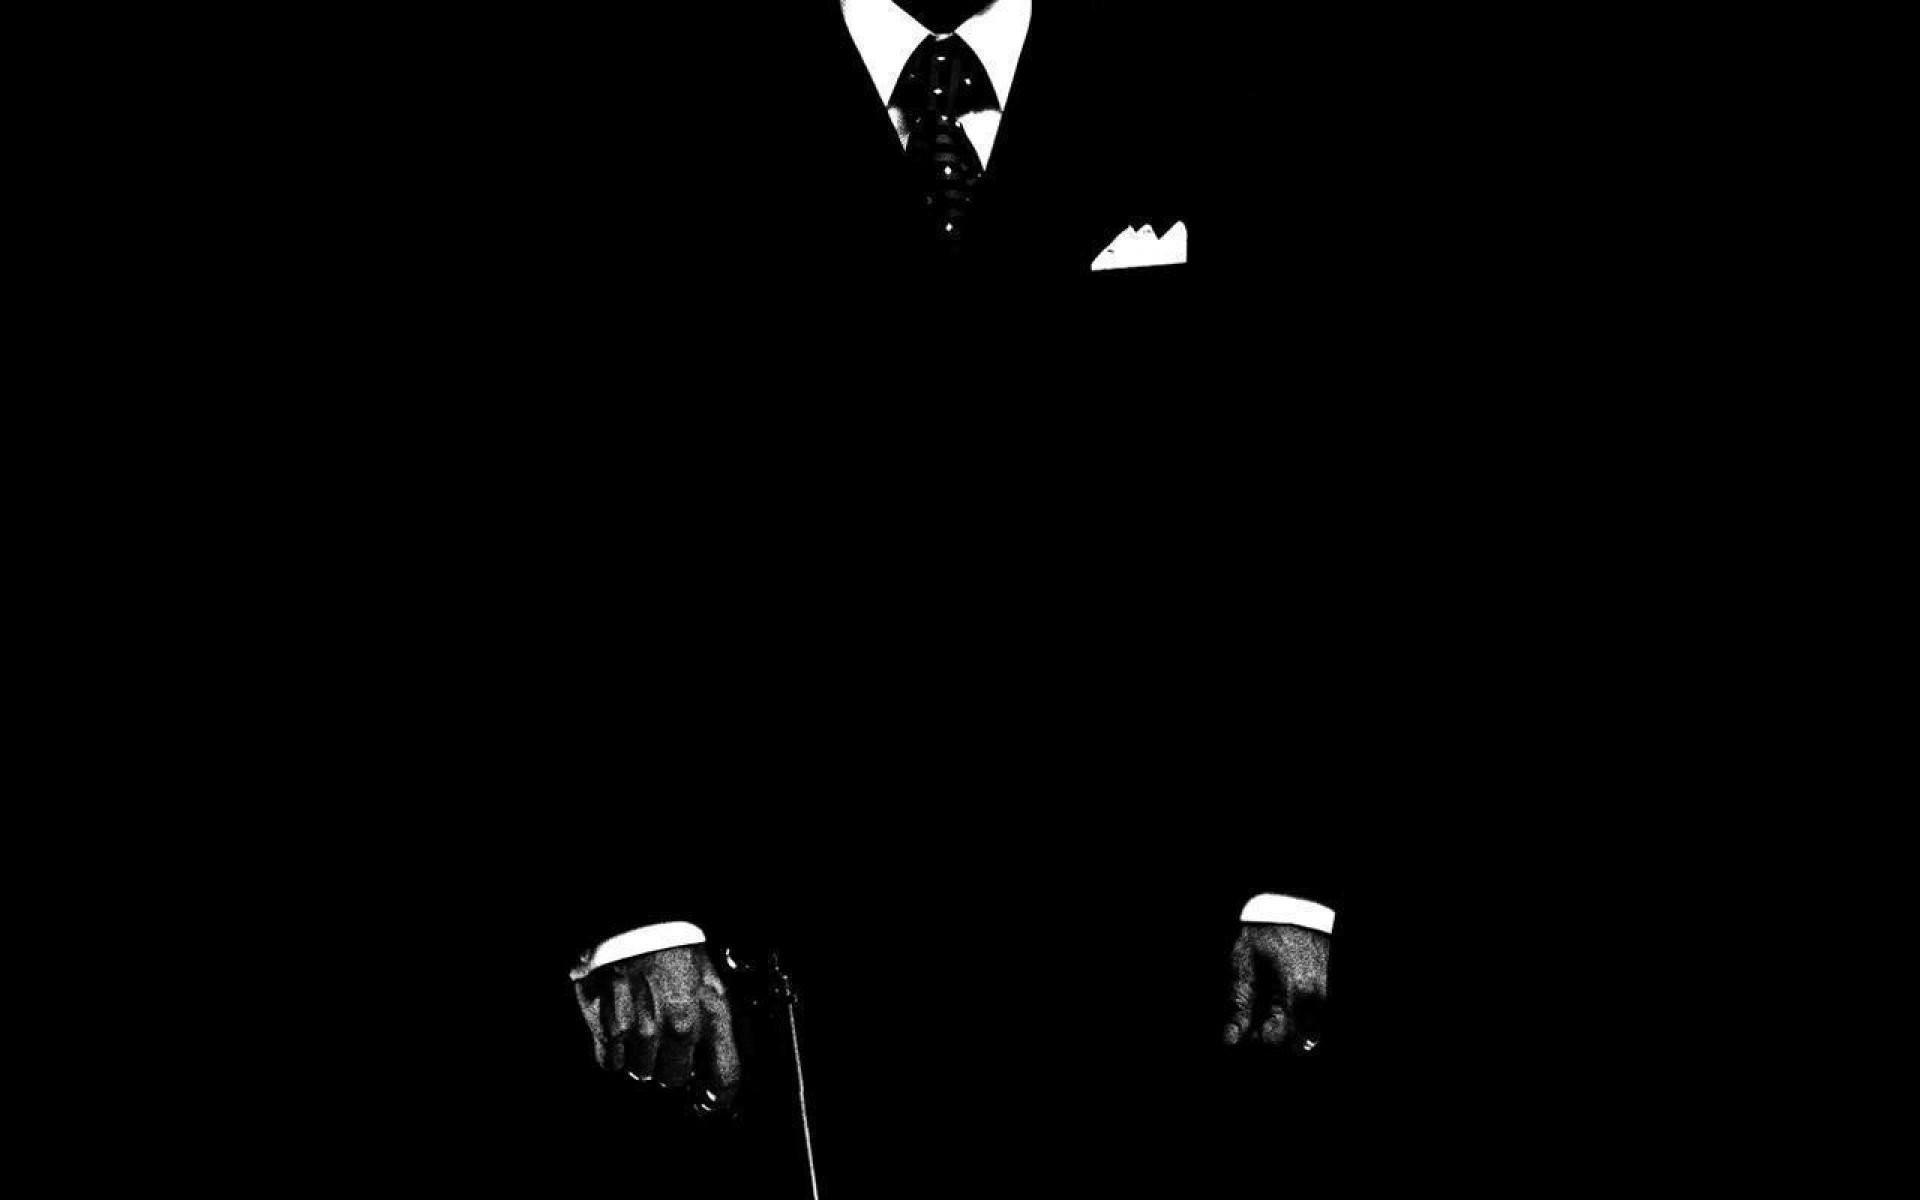 Suits Wallpaper 80 Images